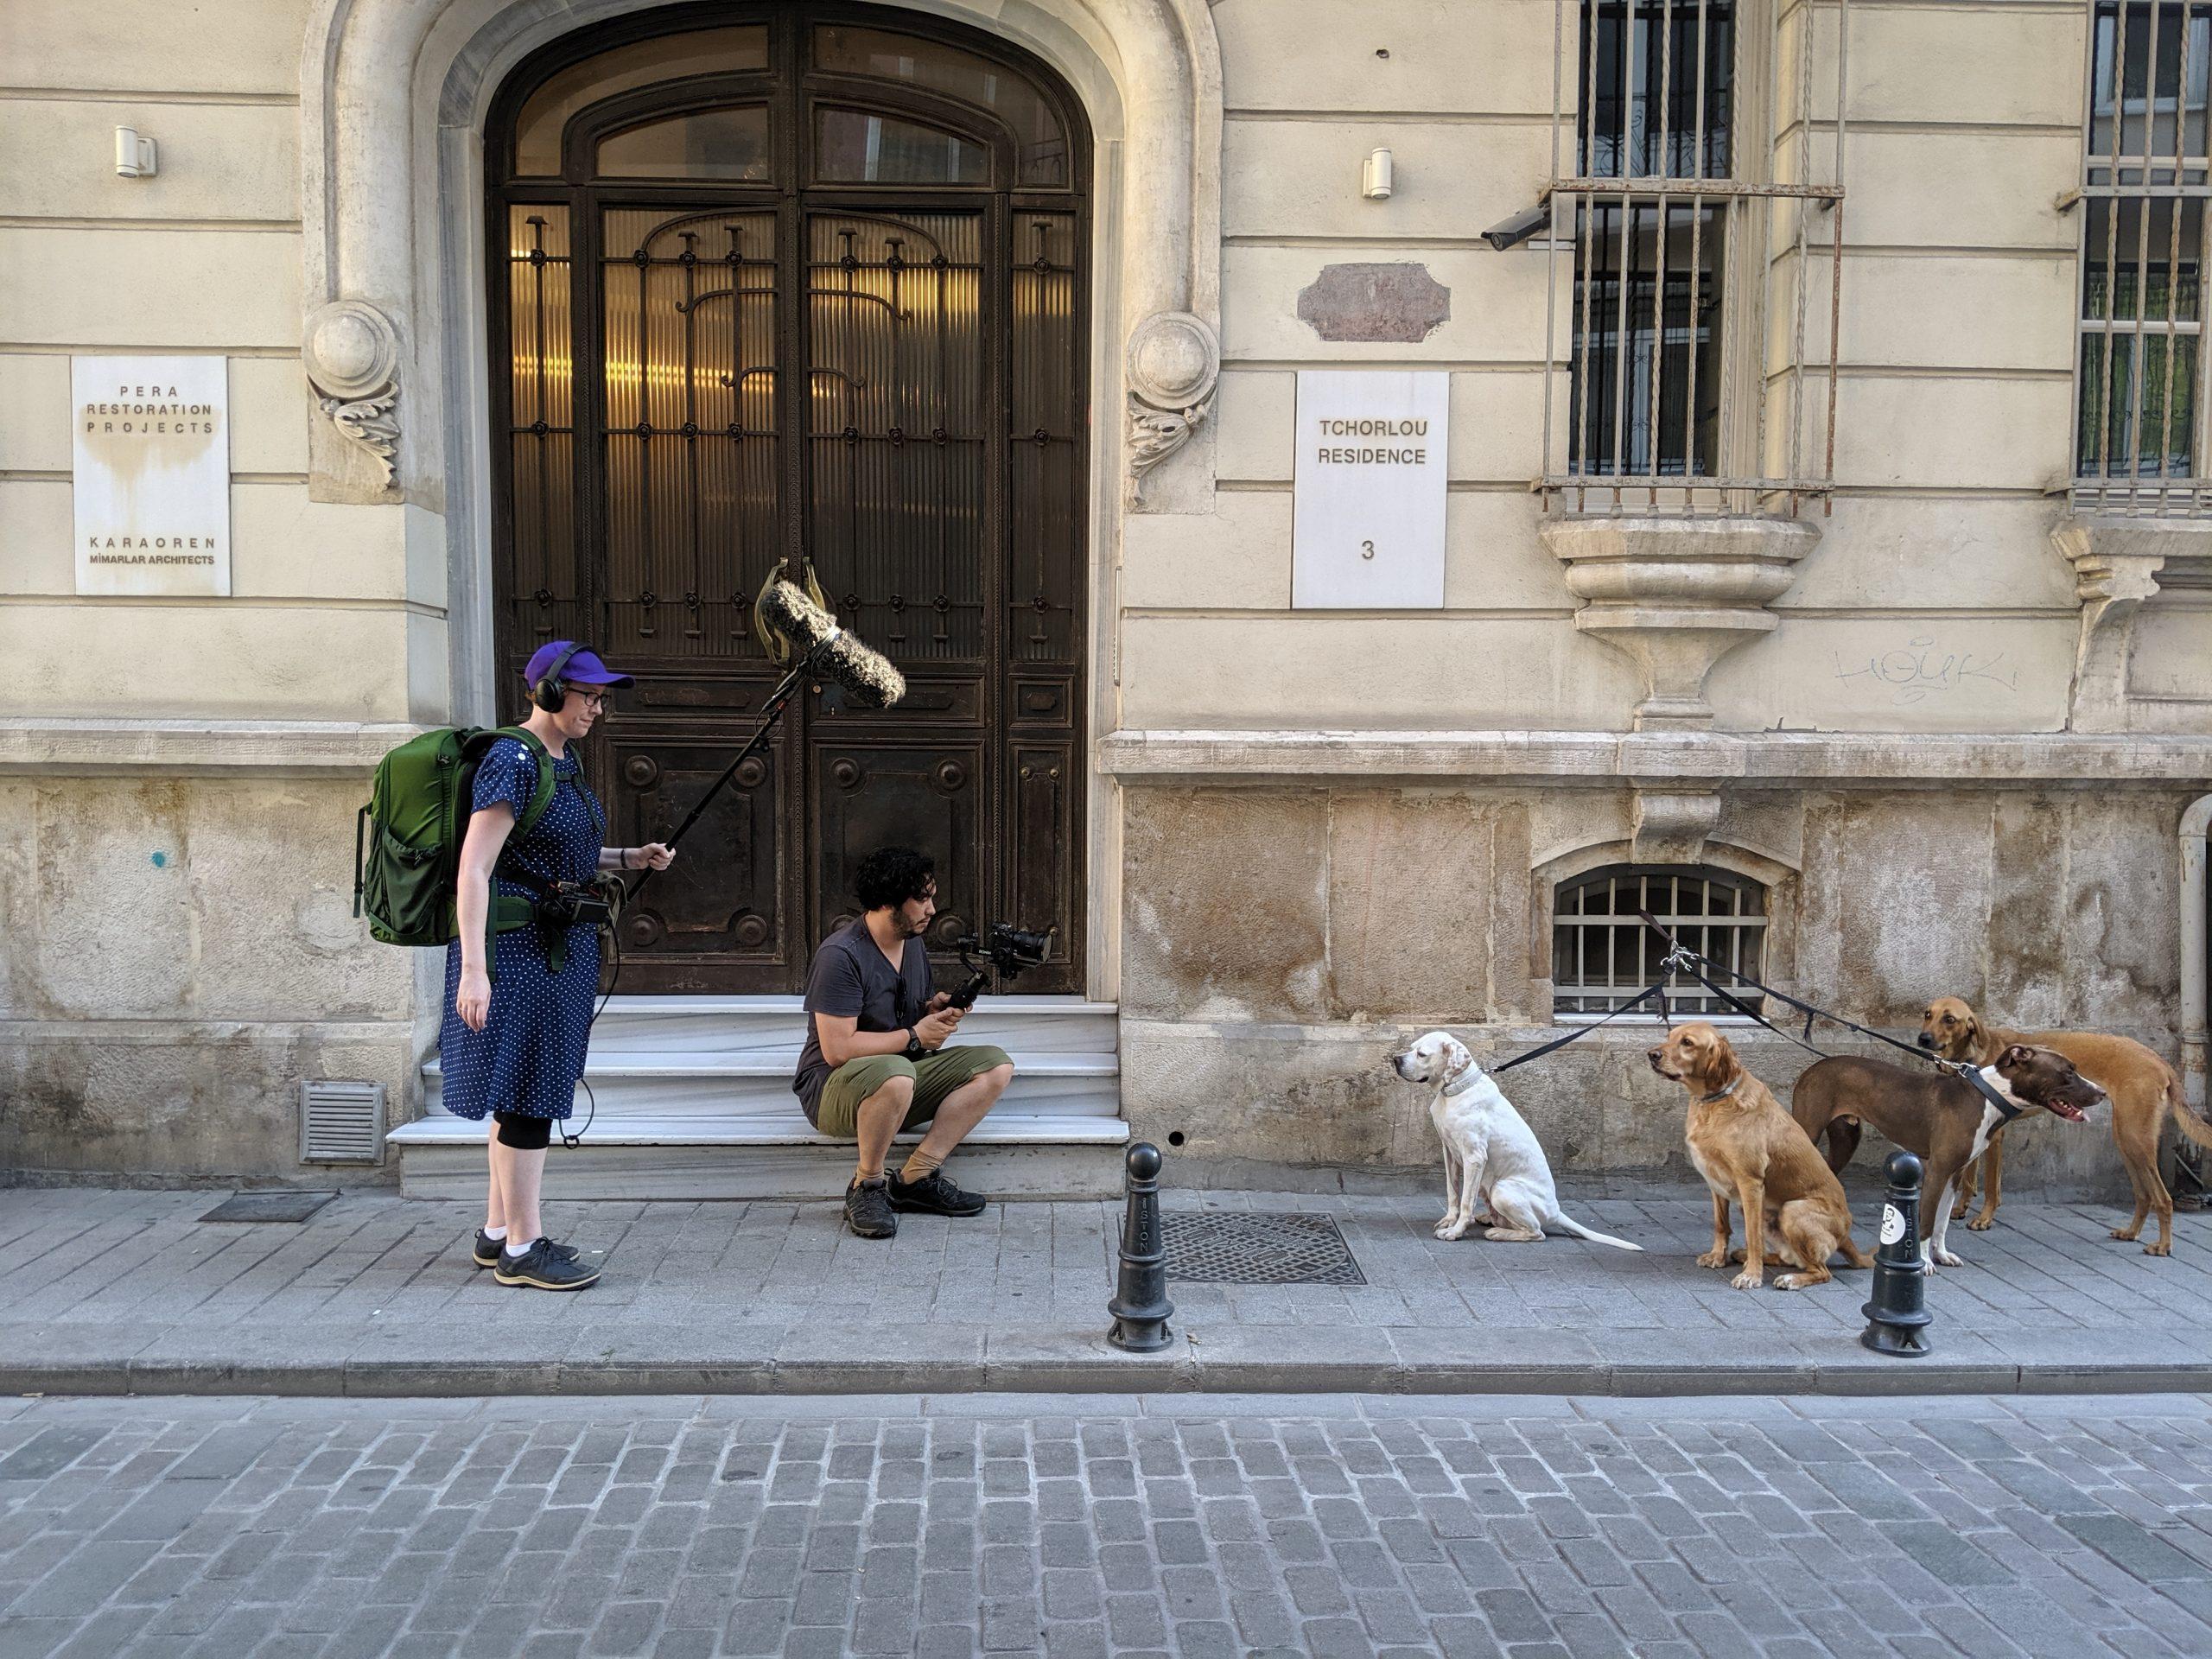 The filmmakers Rose Tucker and Matthew Salleh filming in Istanbul (photo by Sara Merih Ertas)